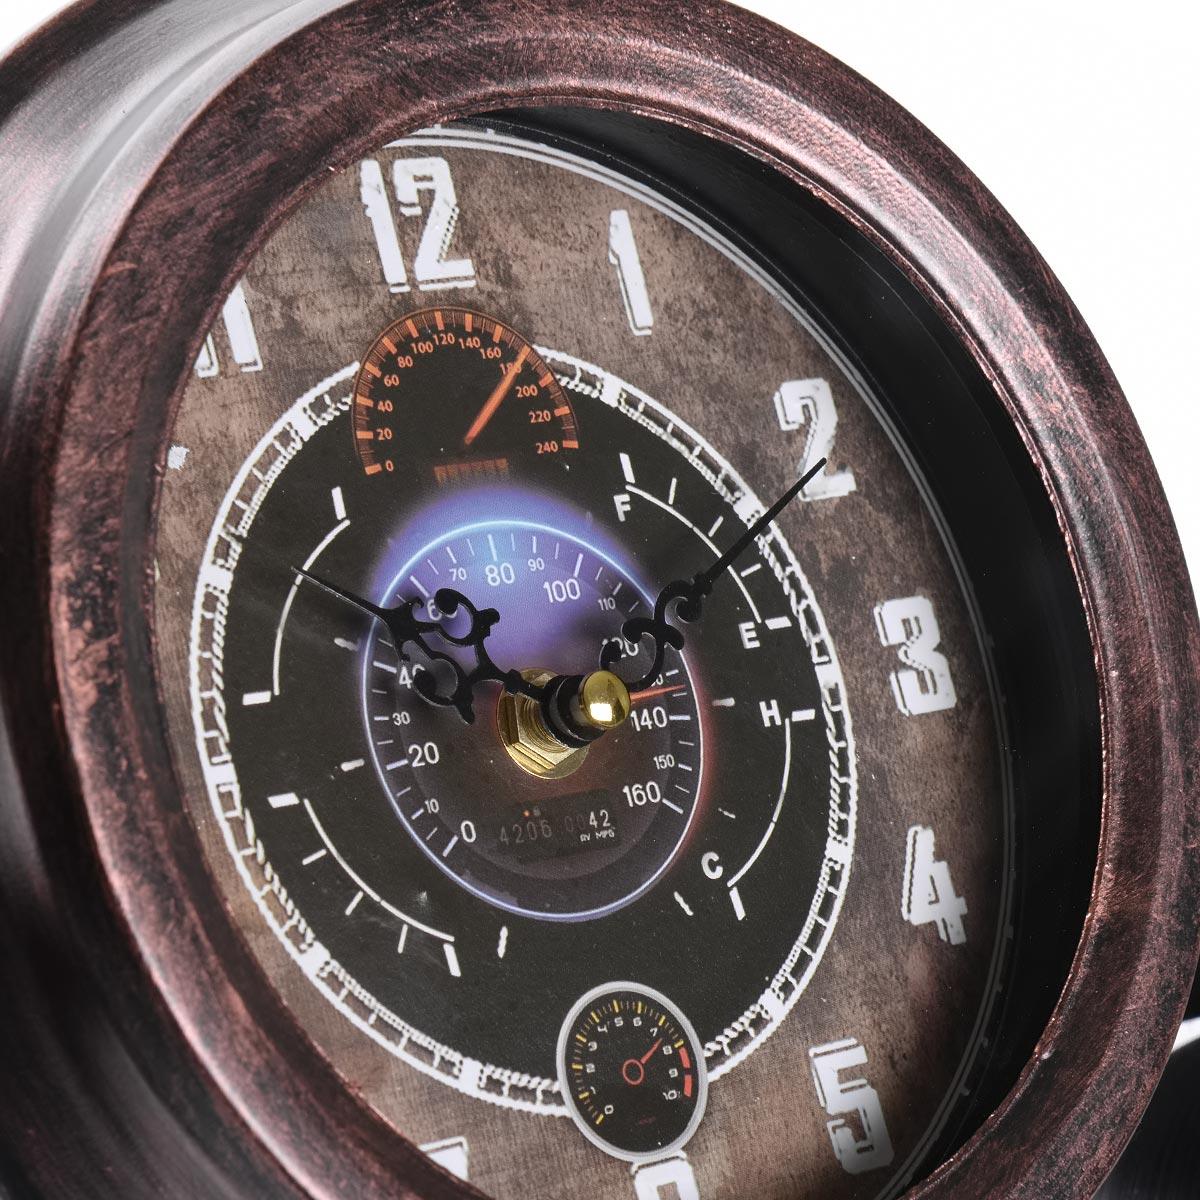 Vintage χειροποίητο διακοσμητικό ρολόι - αεροπλάνο μεταλλικό - OEM 52731